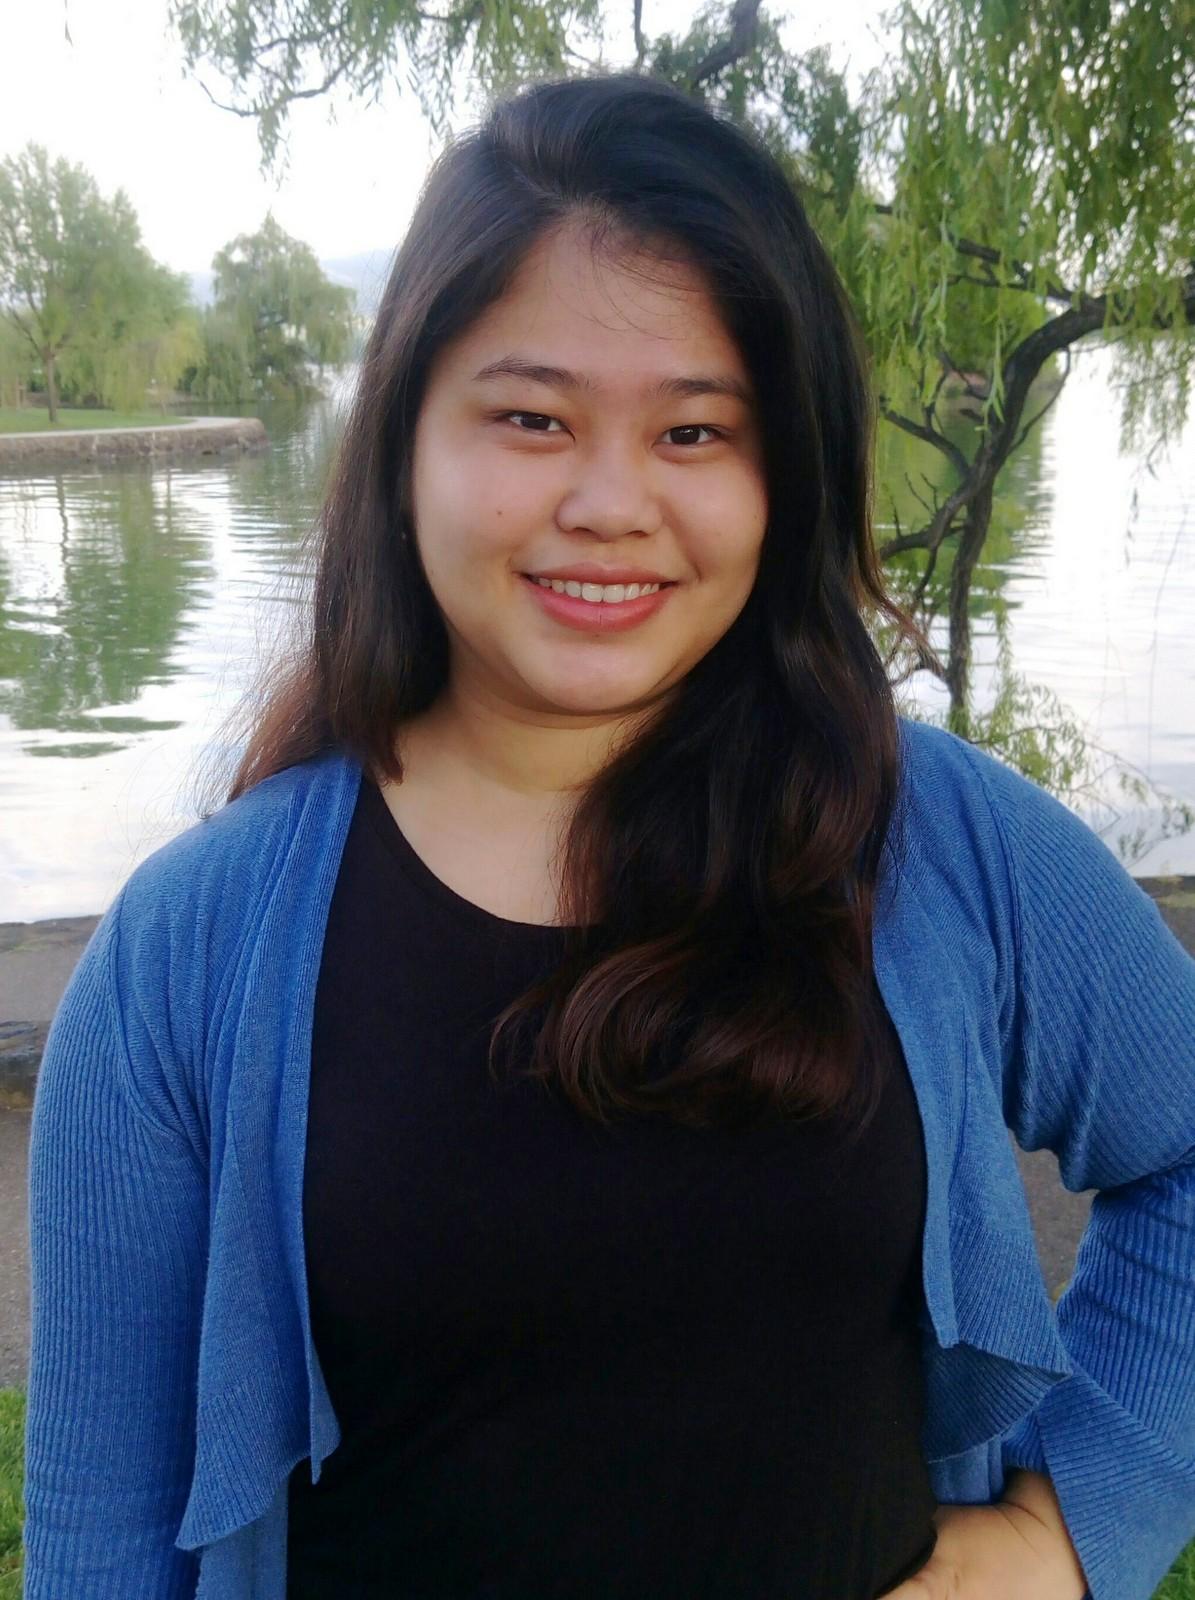 Photo of Cora Oo